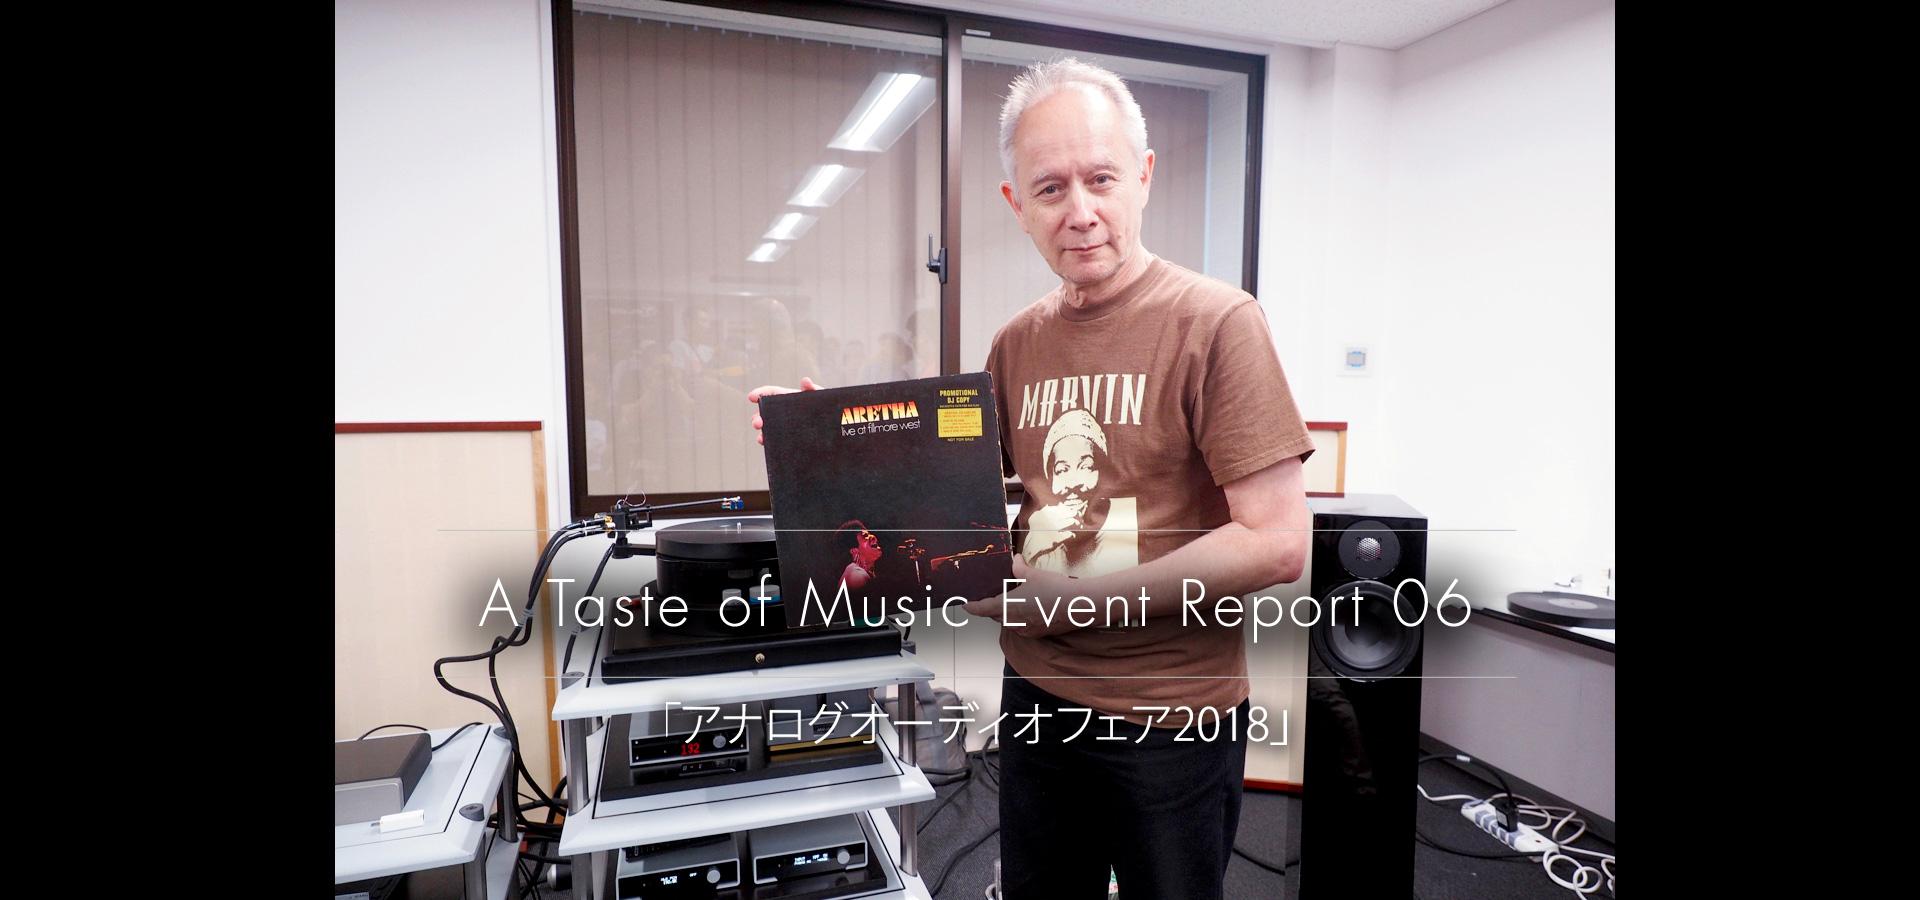 slider image A Taste of Music Event Report 06